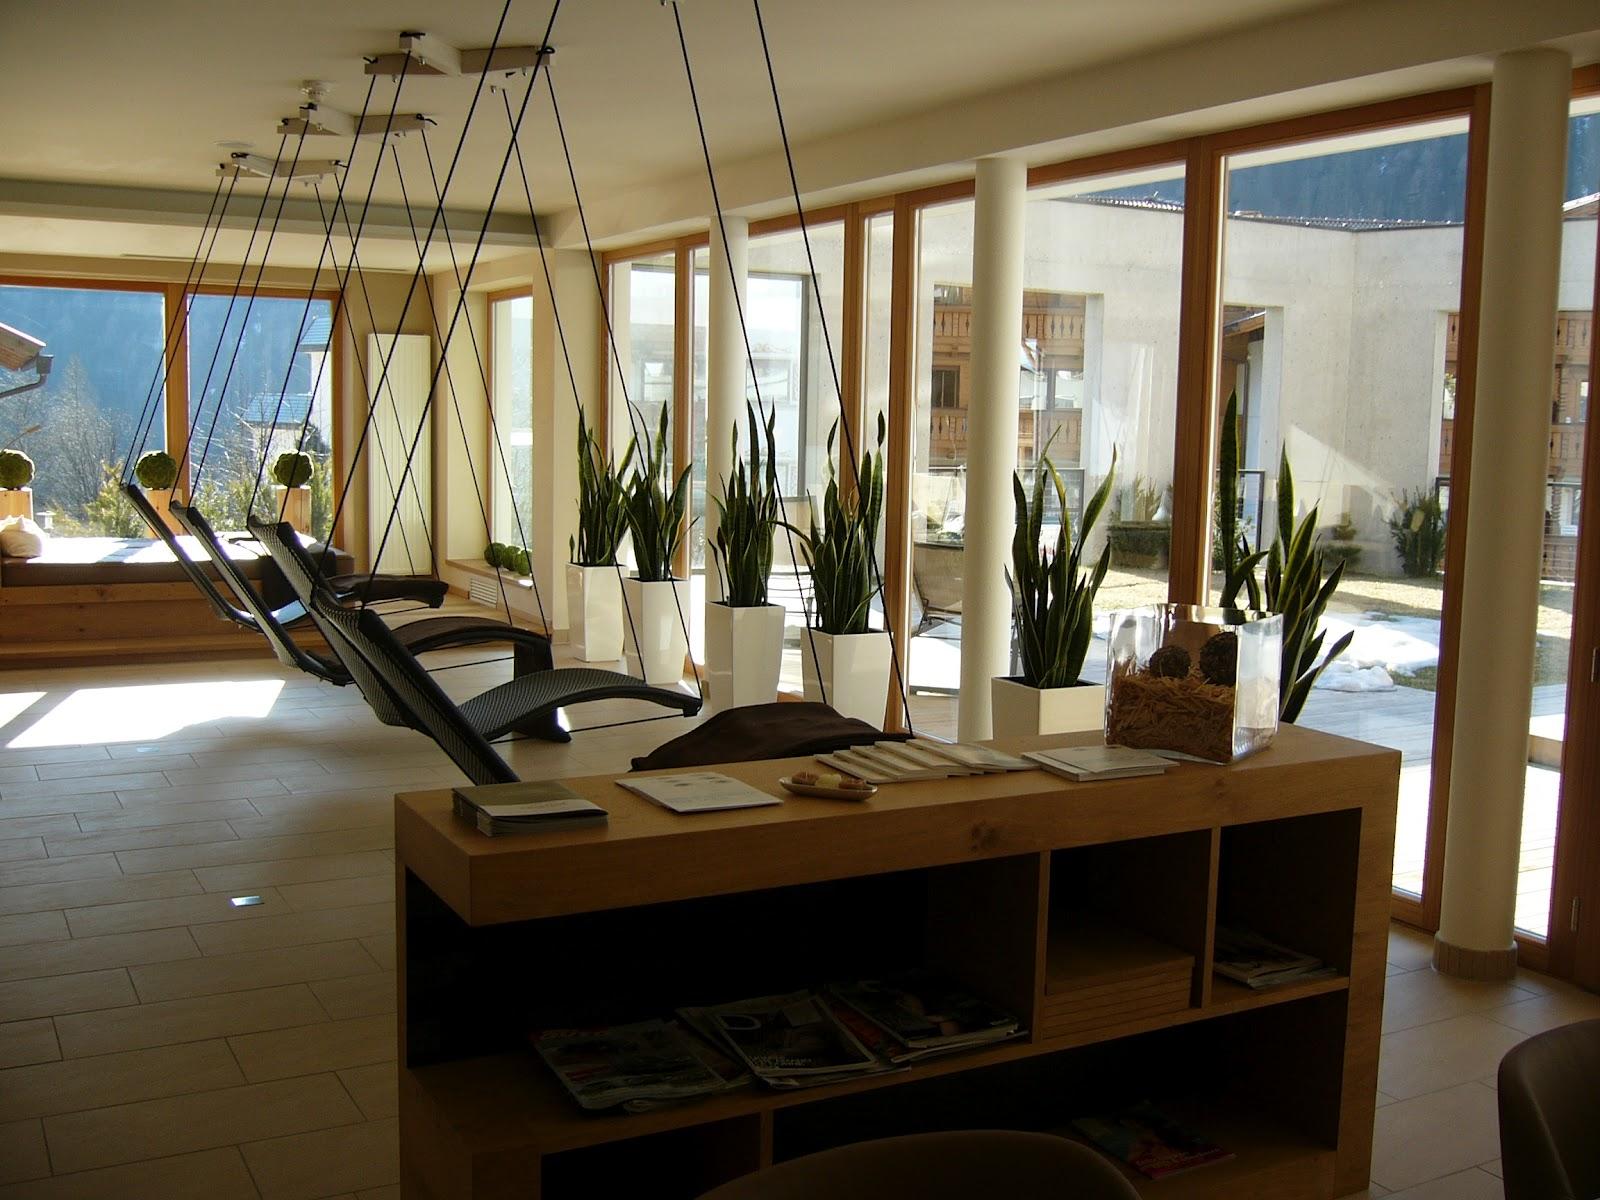 Bagno Ikea Catalogo : Offerte mobili bagno ikea catalogo mobili per bagno ikea catalogo